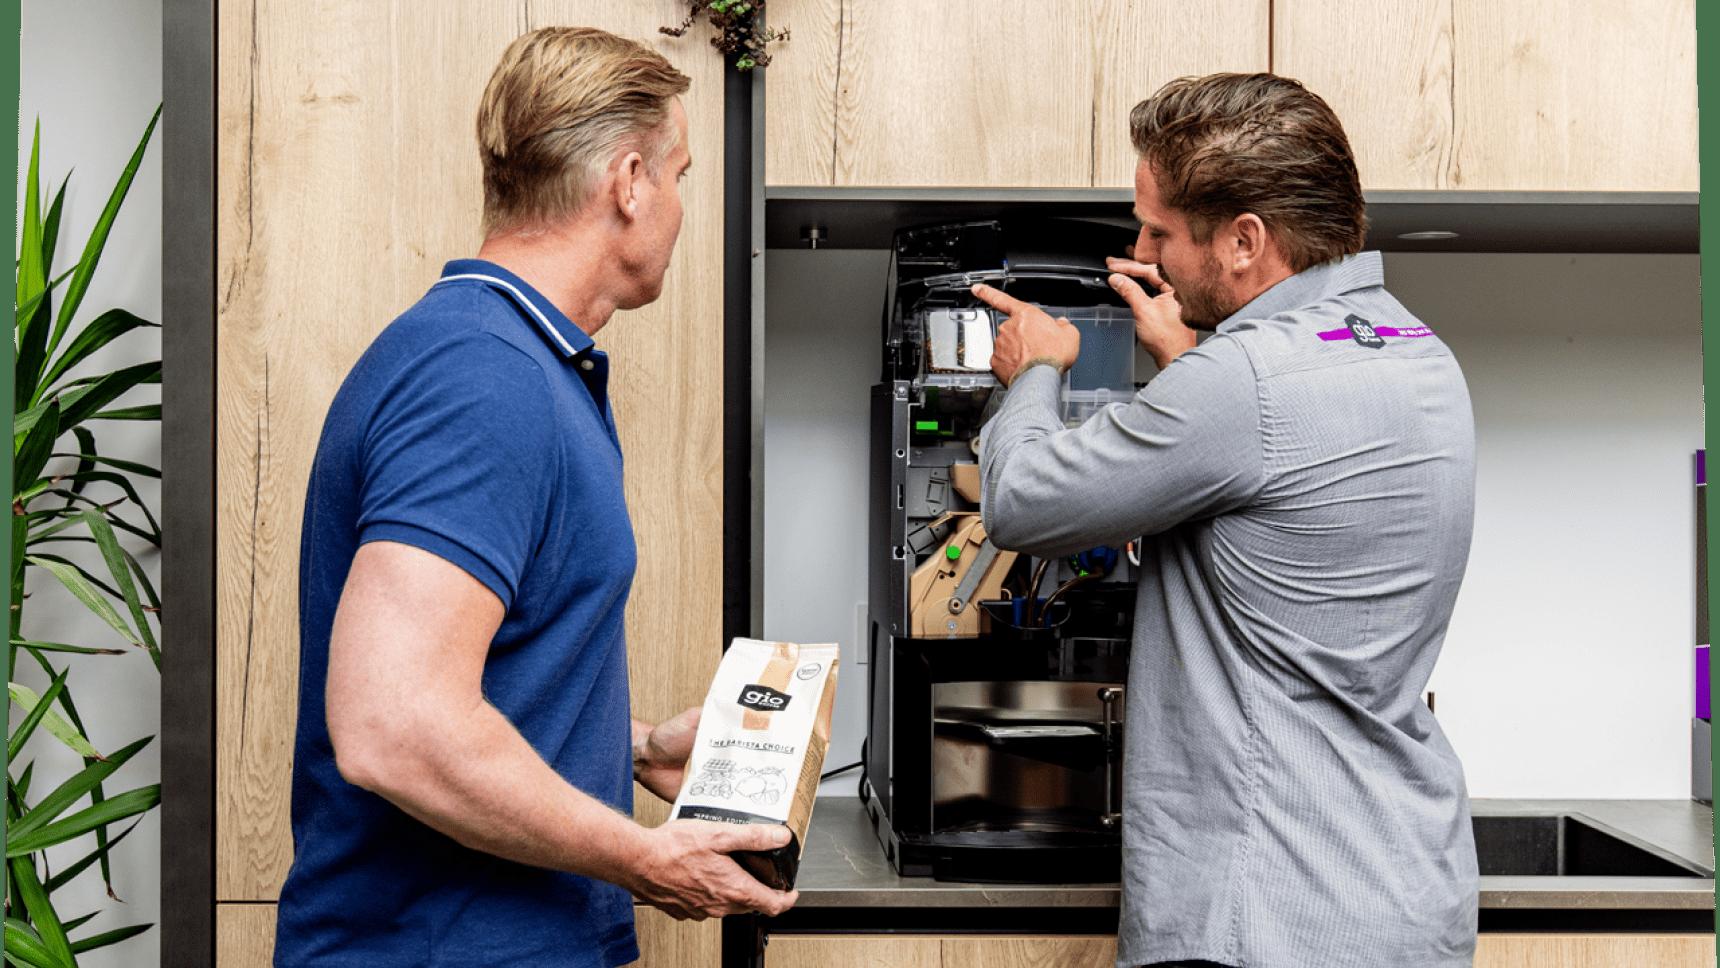 Gio Coffee koffiespecialist legt uit hoe de koffiemachine werkt